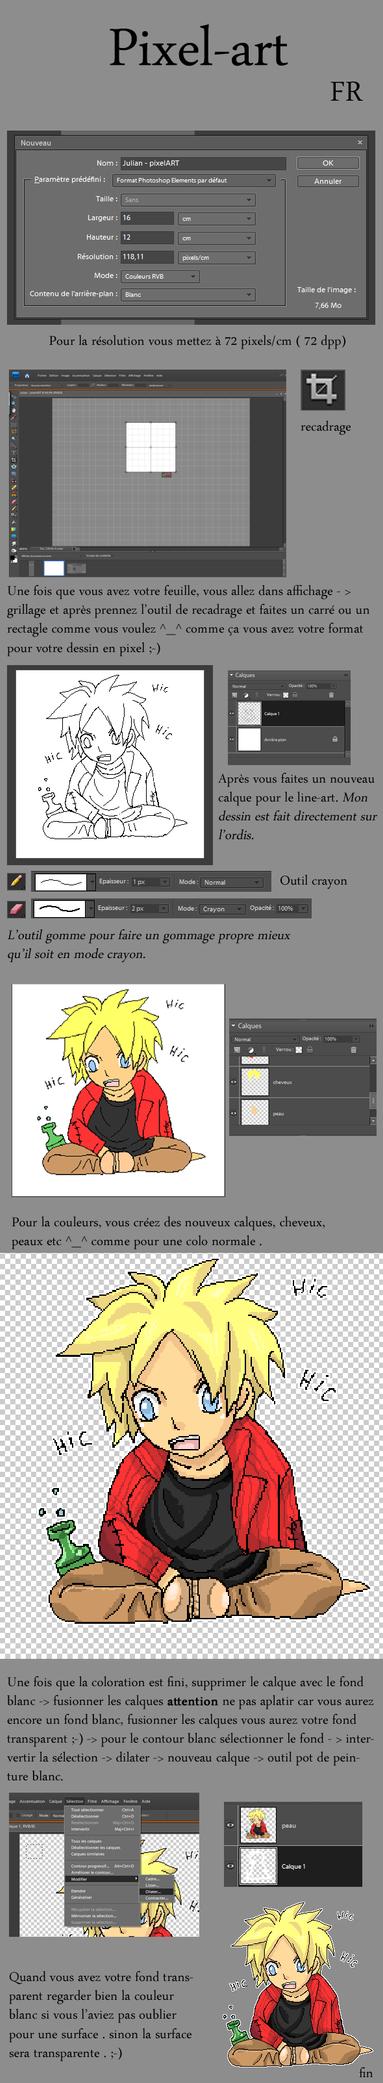 tuto-pixelART by hiromihana